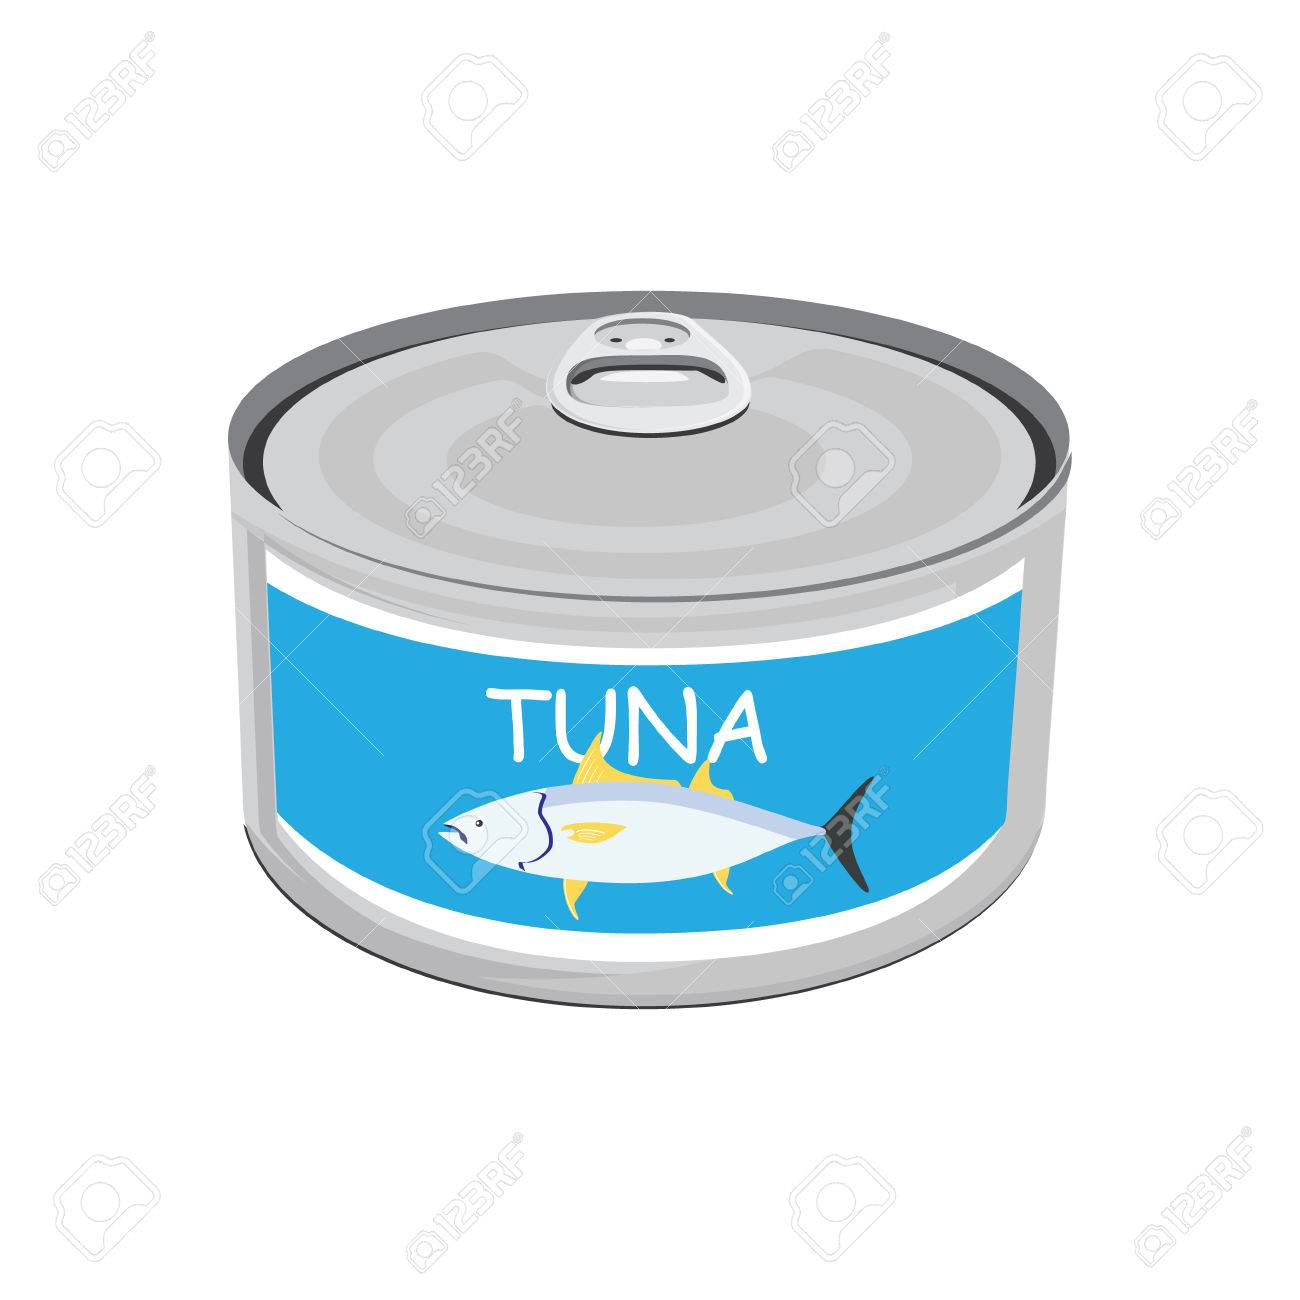 Image result for tuna  icon